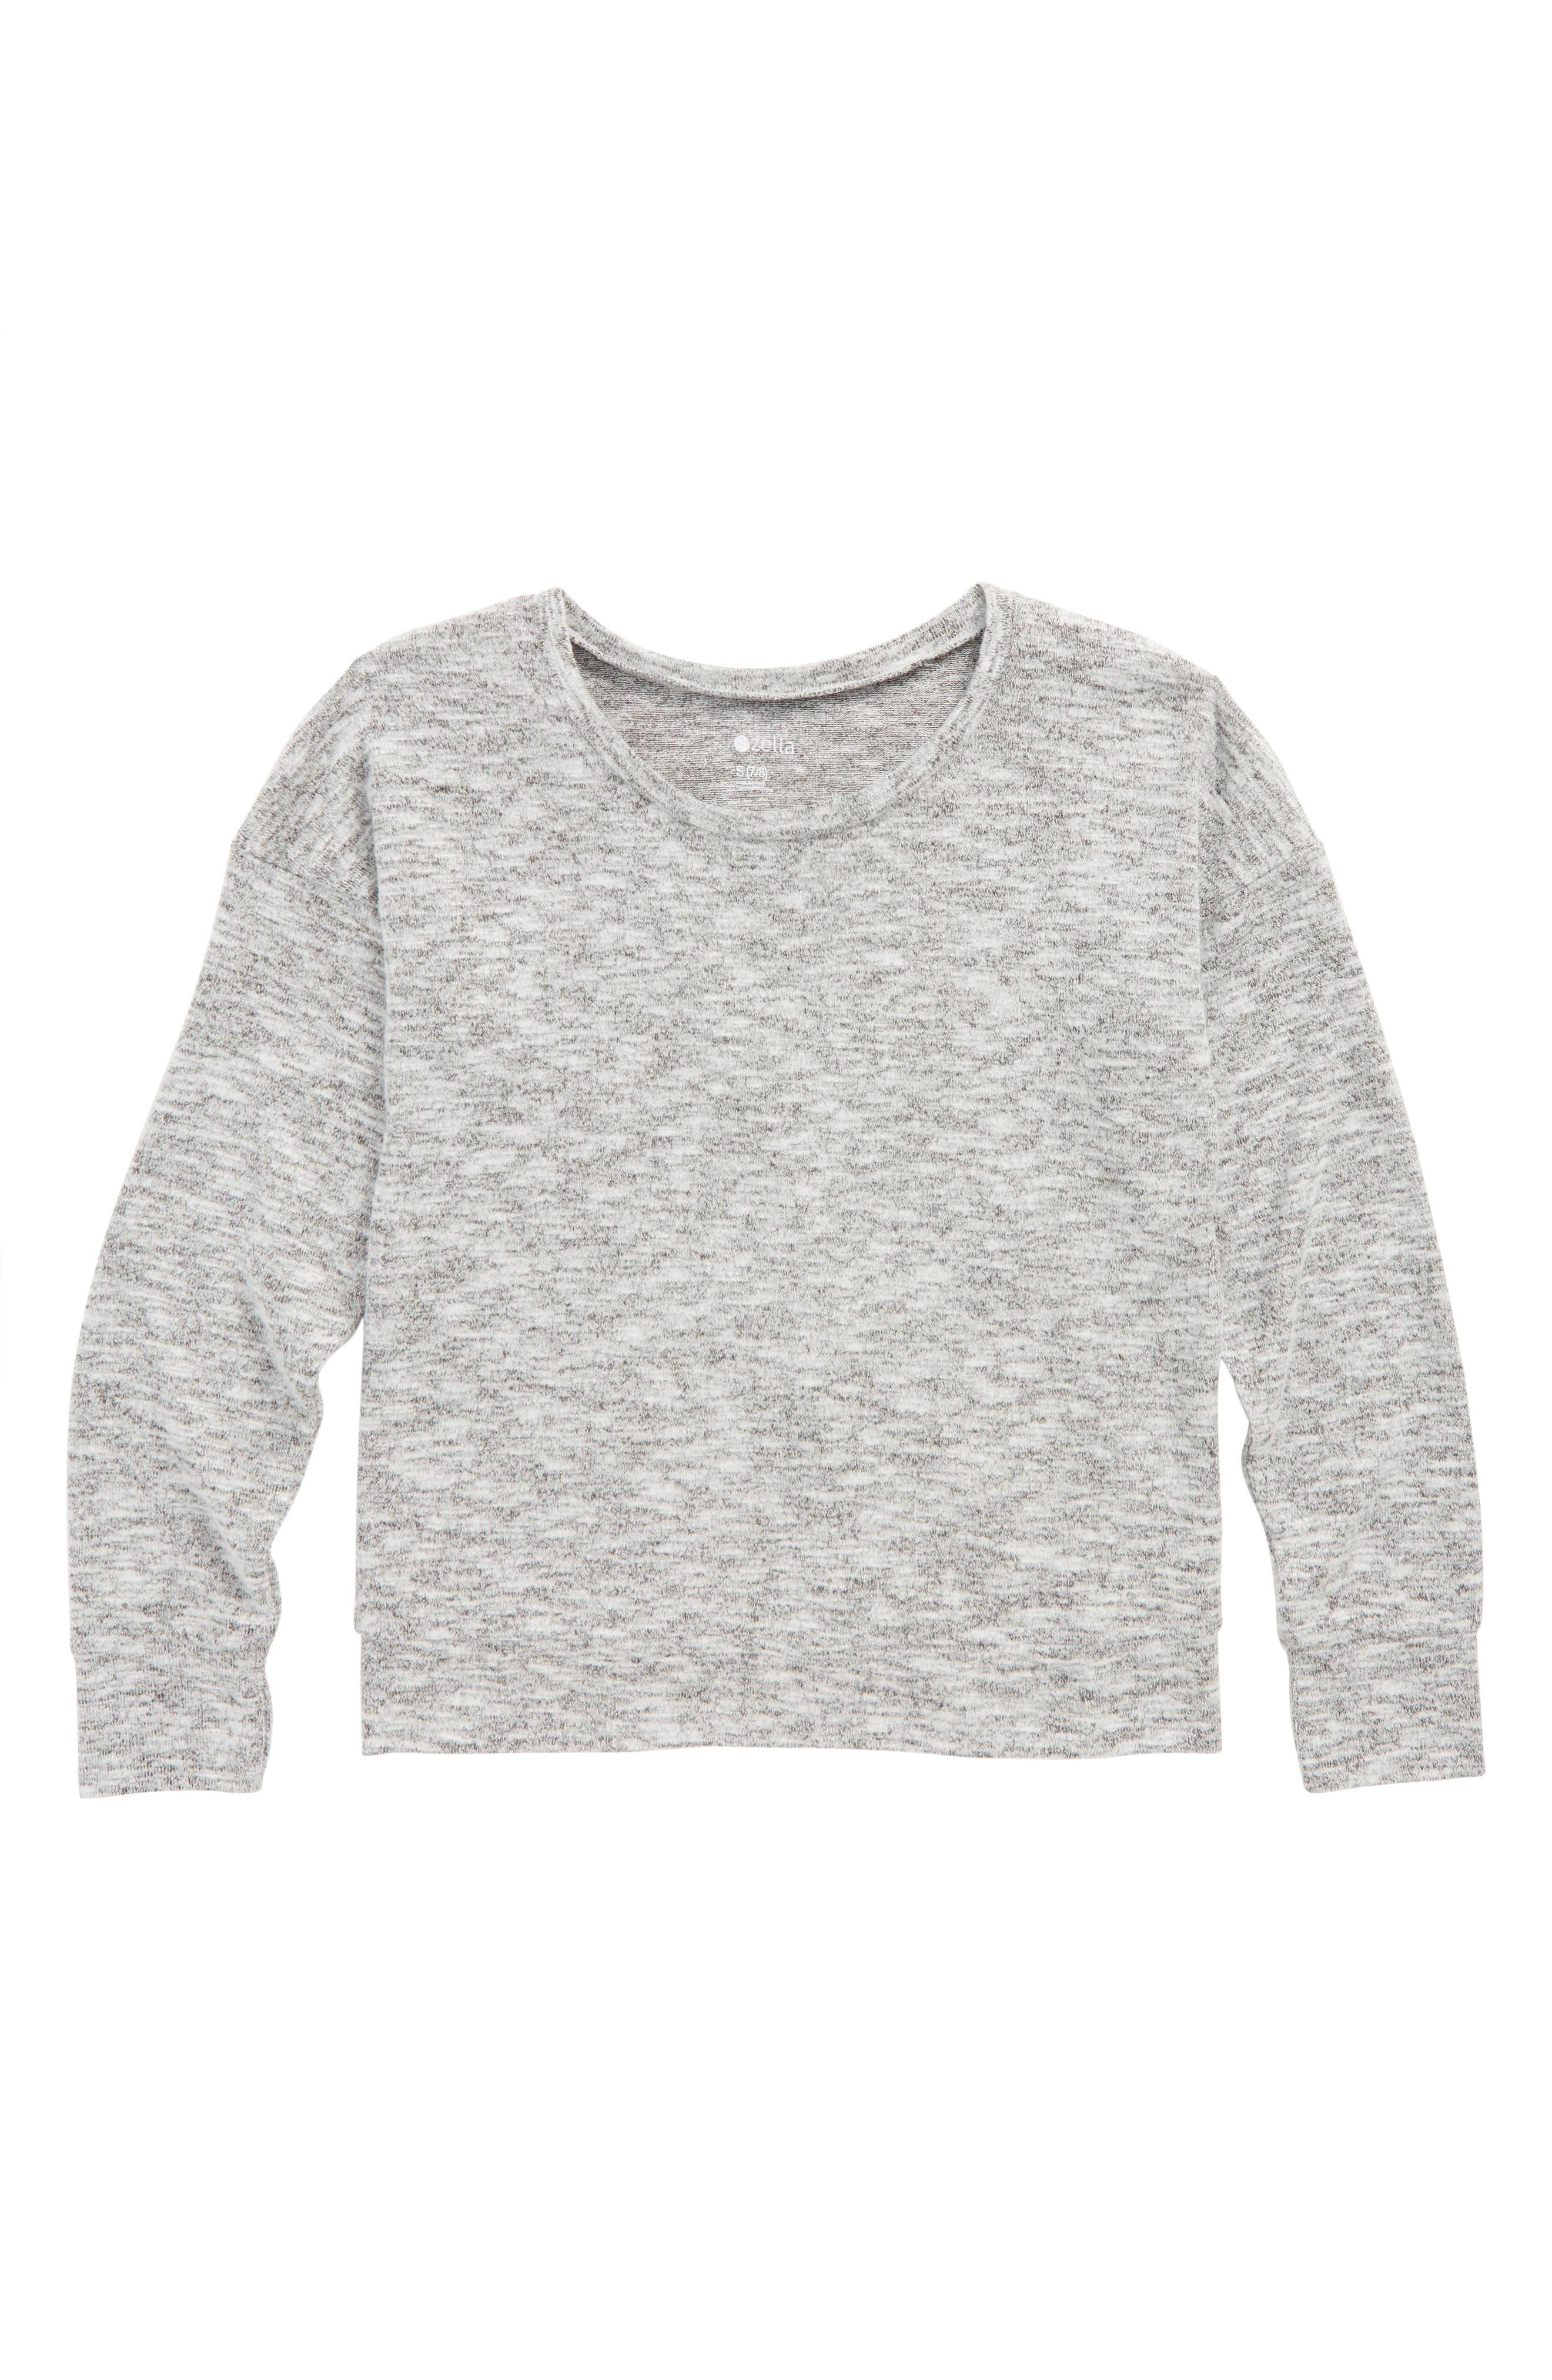 Zella Open Back Sweater,                             Main thumbnail 1, color,                             Black- White